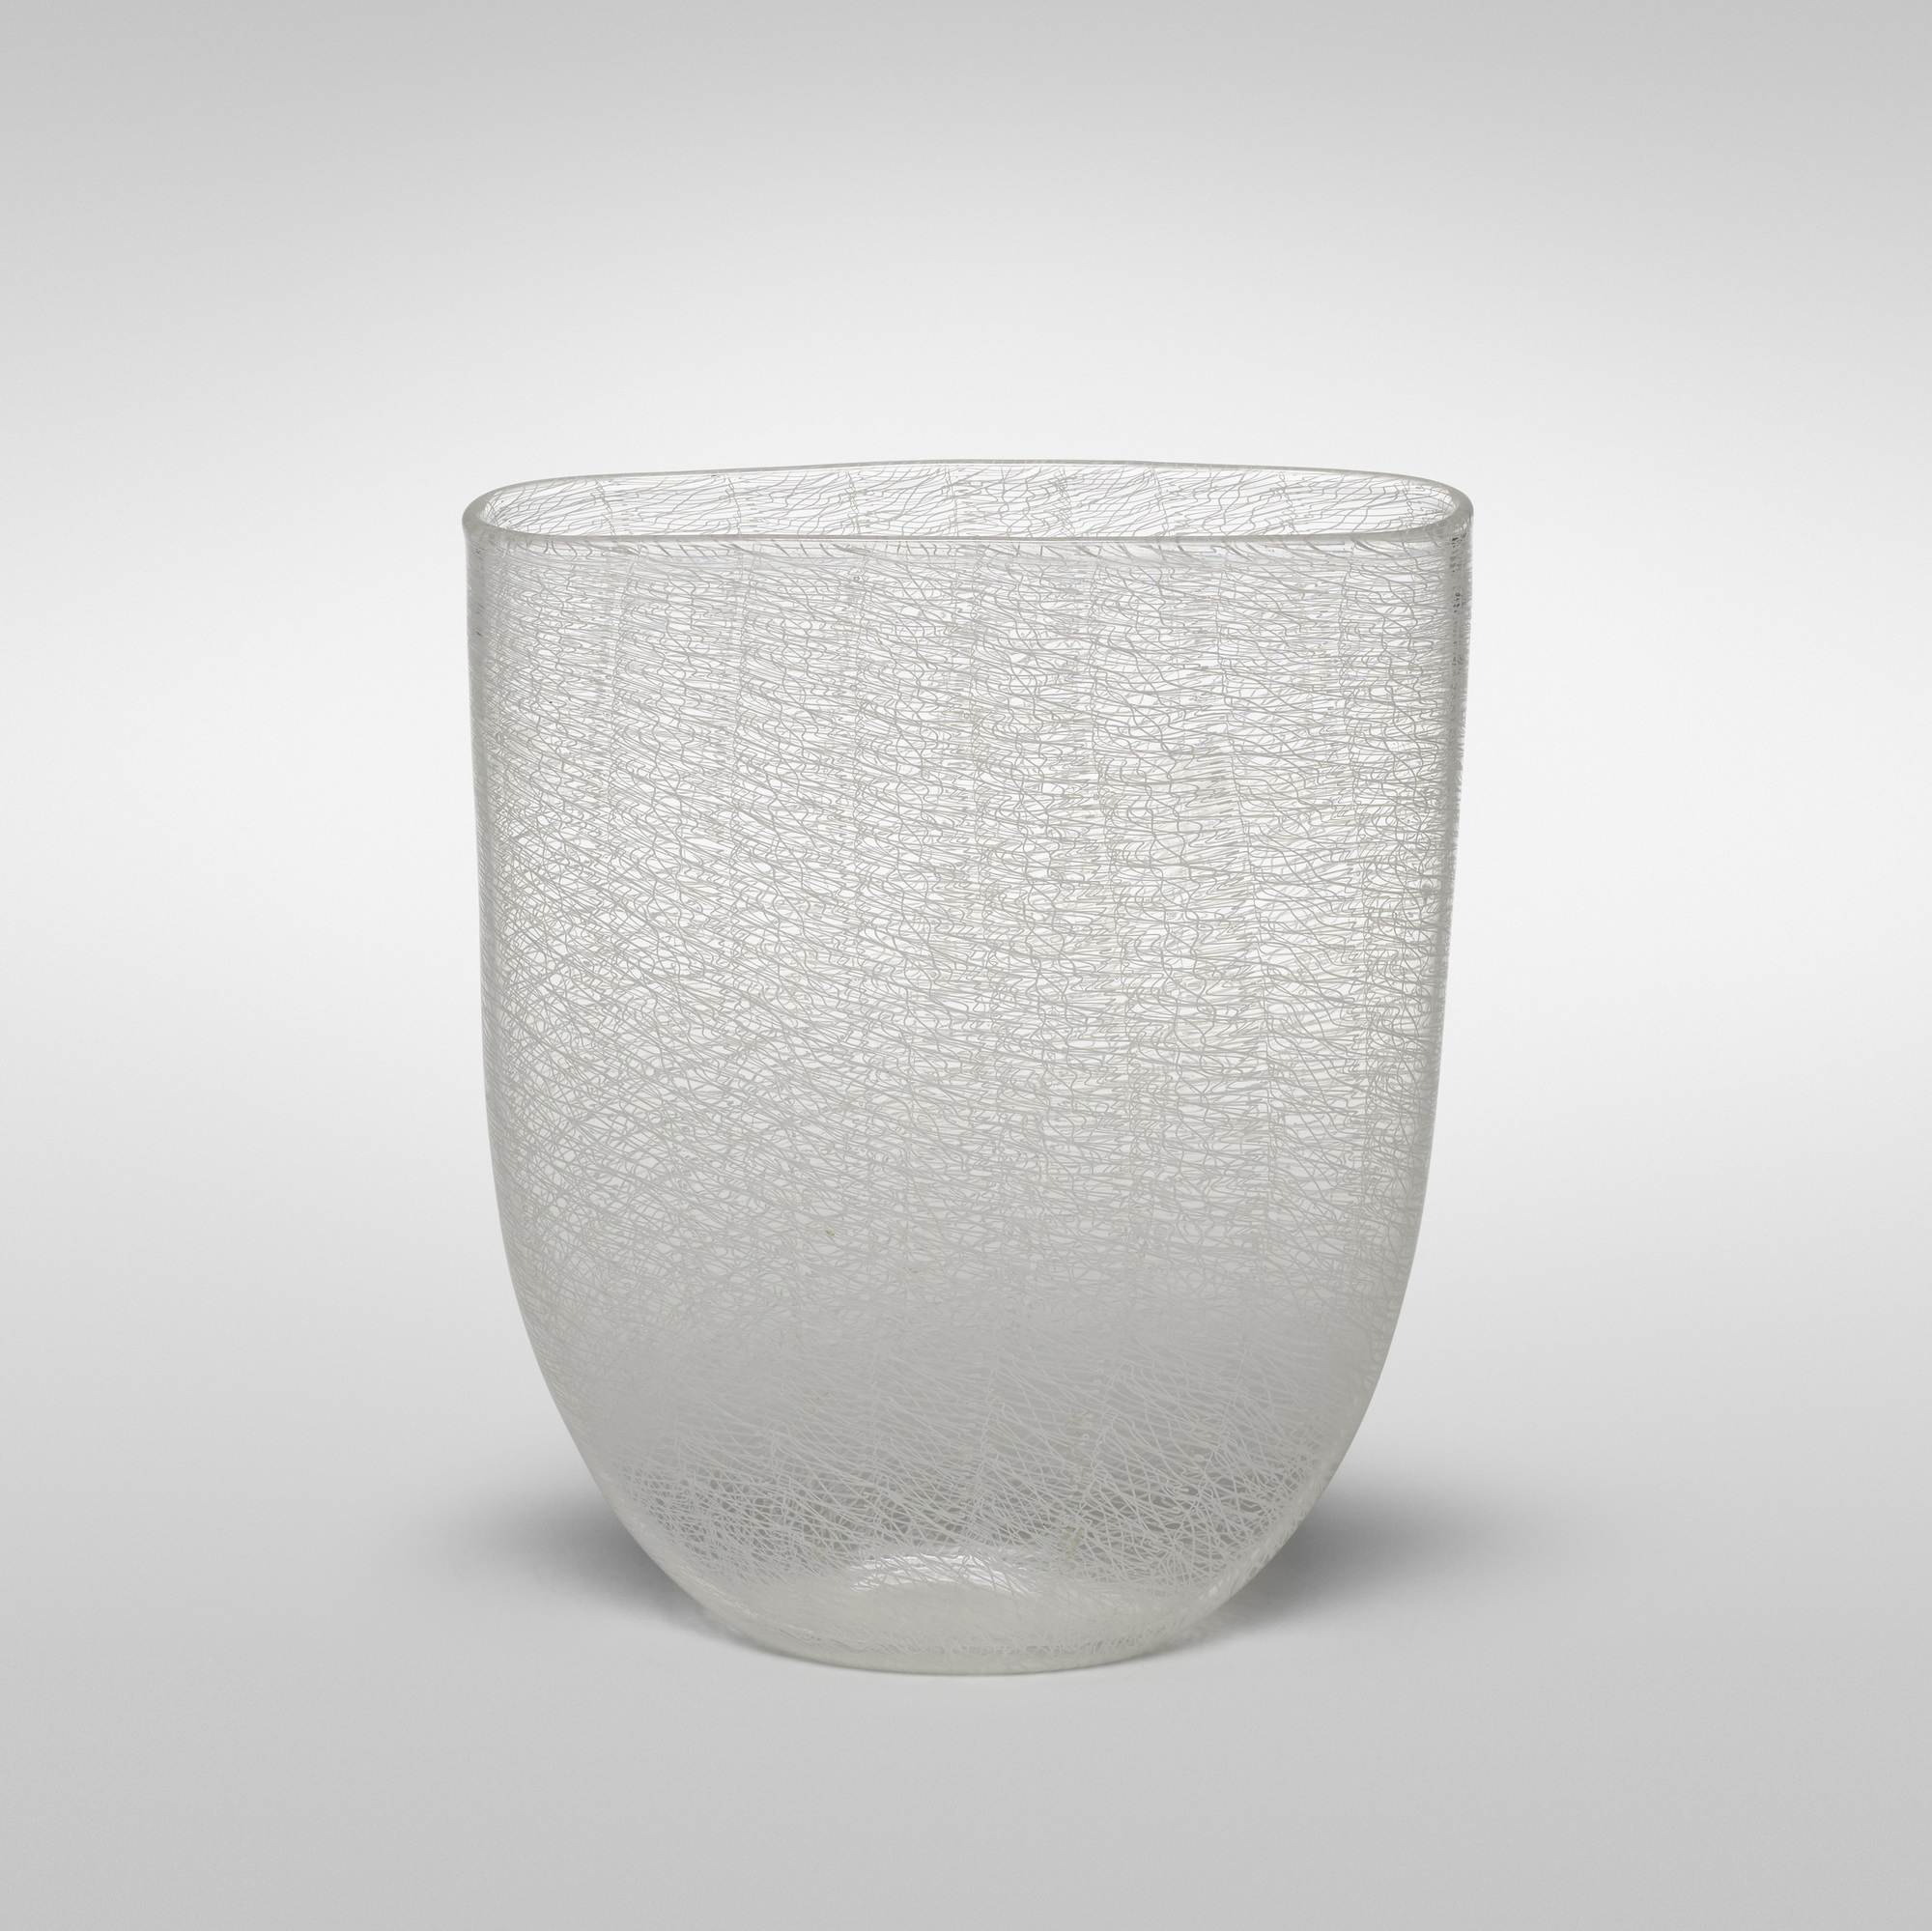 171: Archimede Seguso / Merletto vase (2 of 3)